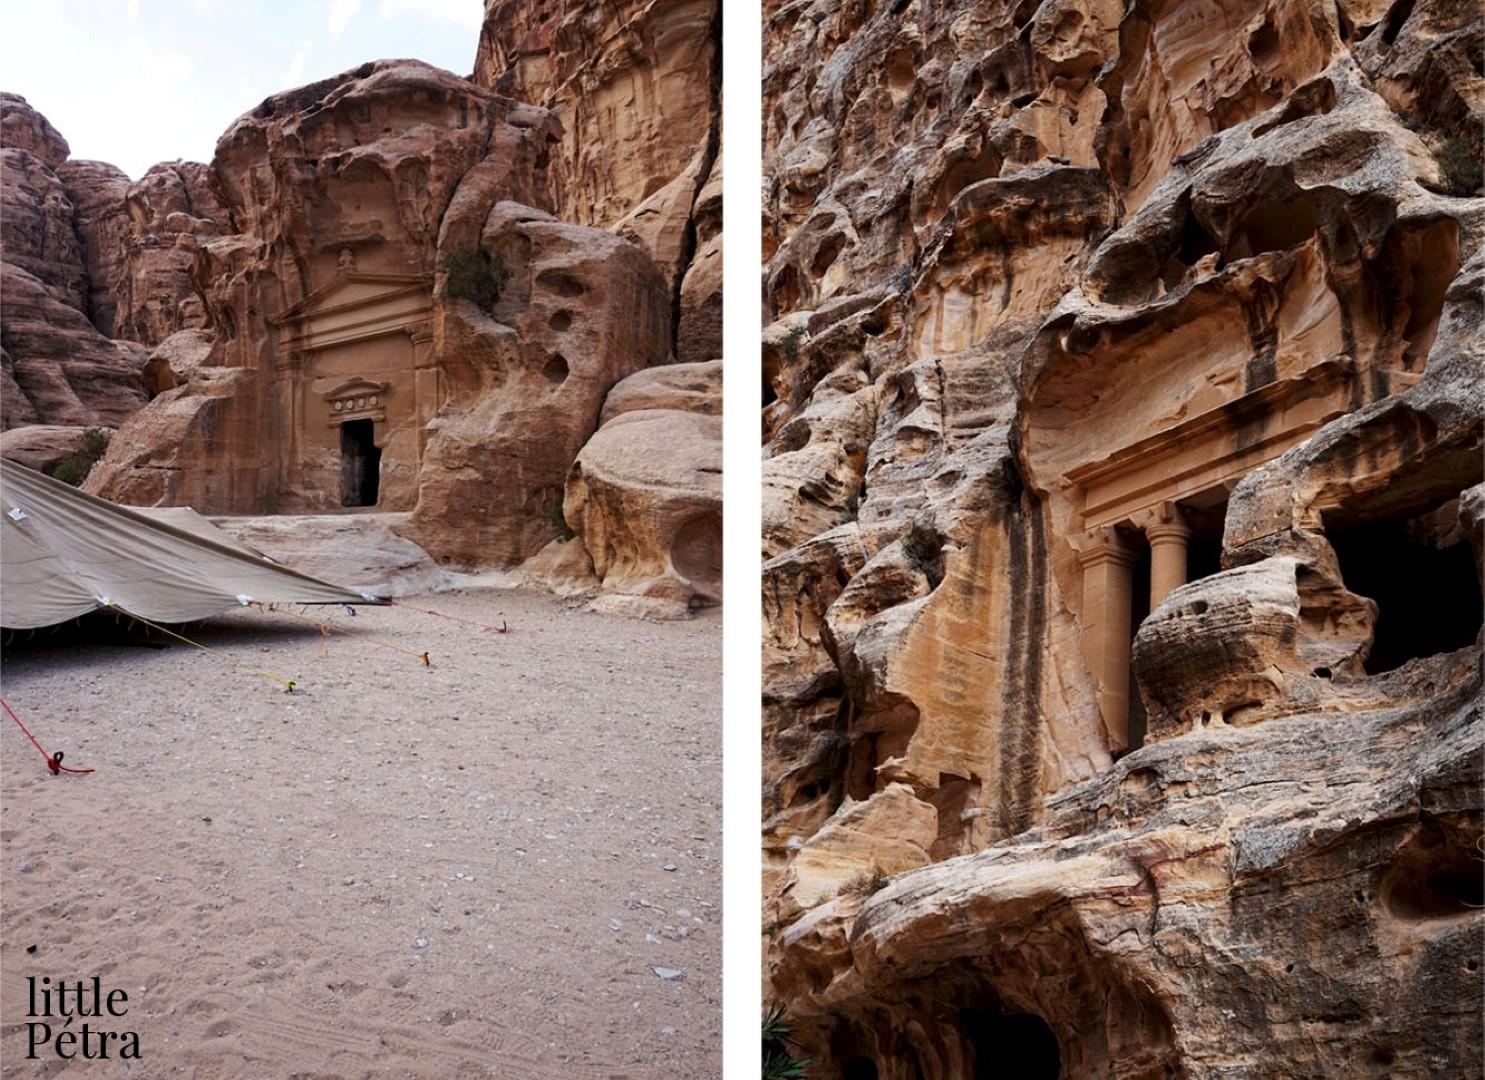 Voyage en Jordanie - Petra Wadi-Rum - Little Petra